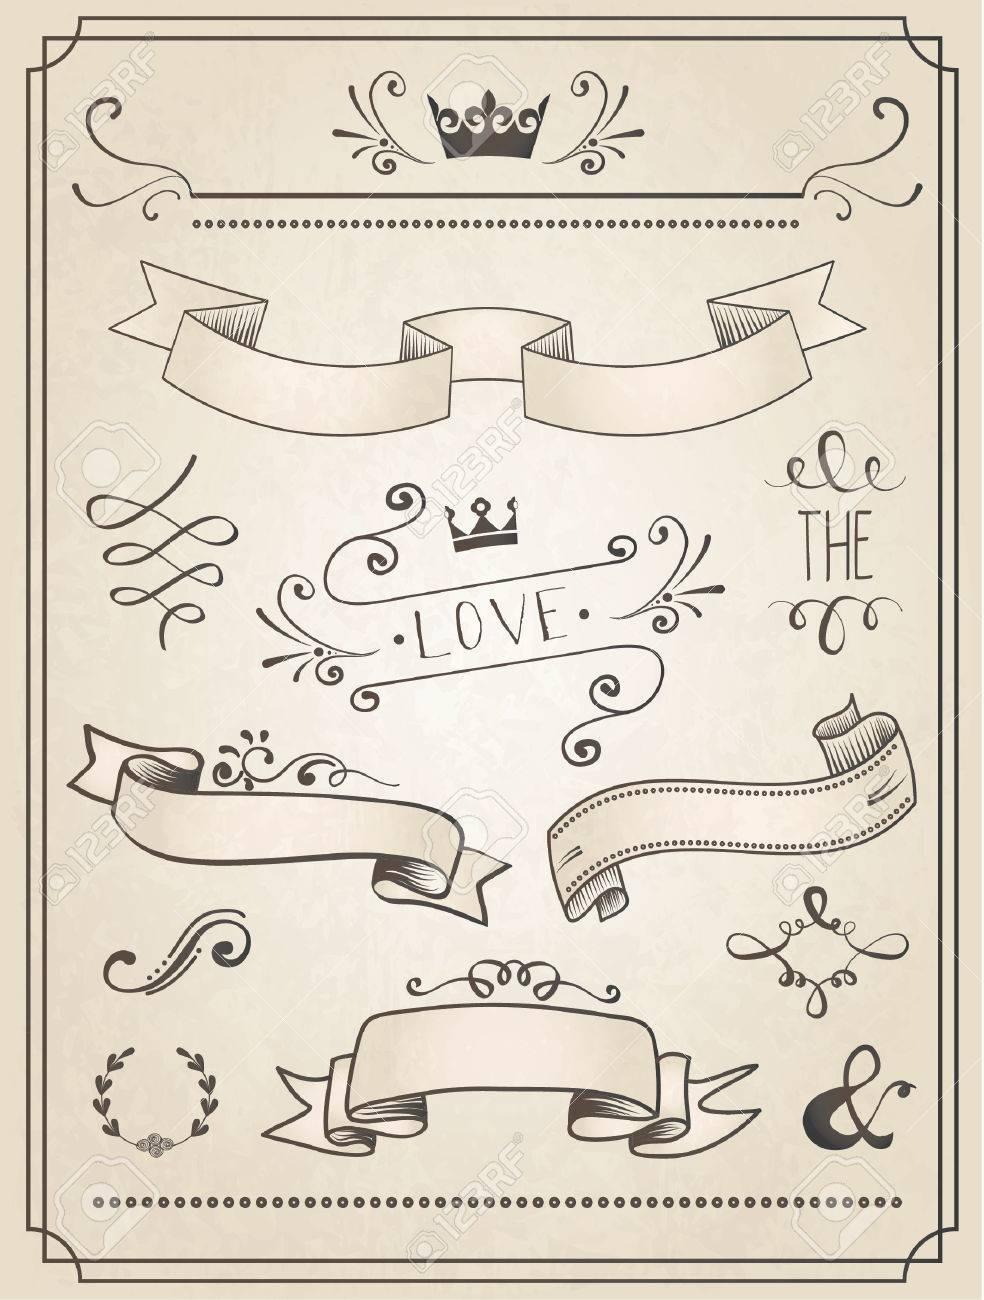 Vintage Wedding Grafiksatz, Rahmen, Pfeile, Herzen, Lorbeer ...